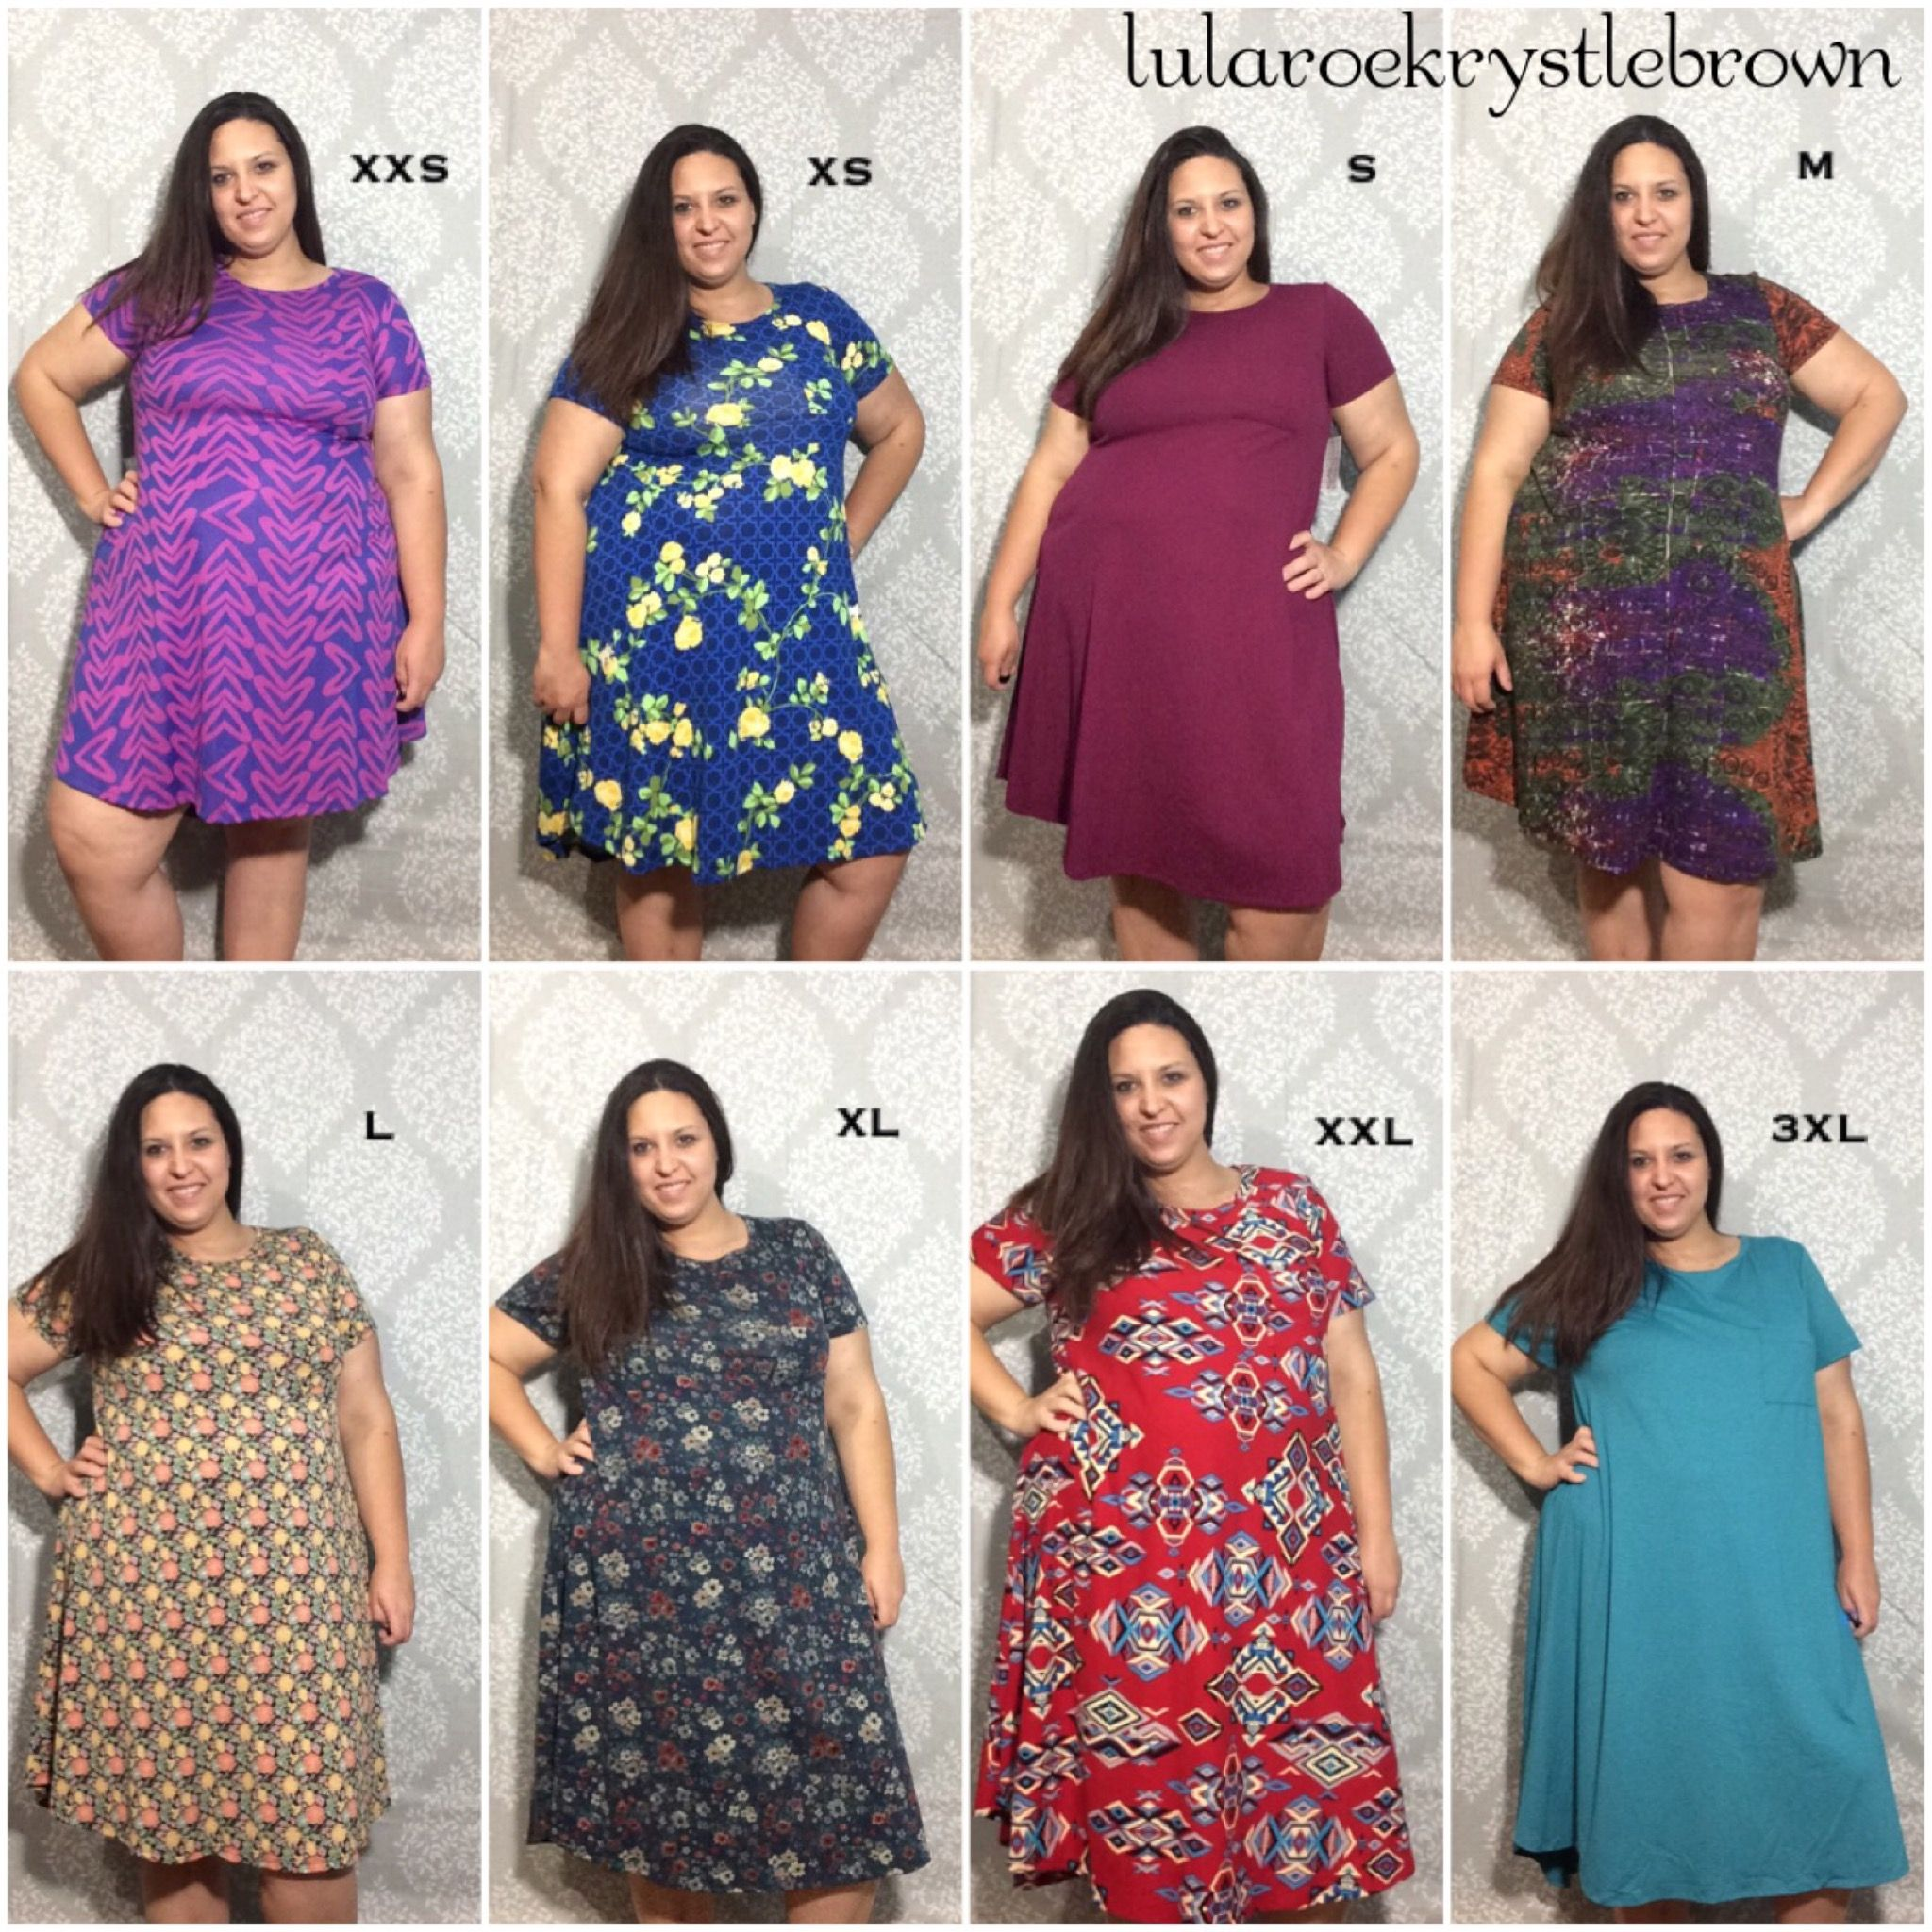 b1c1dea6a27db LuLaRoe Carly styling, LuLaRoe Carly sizing, plus size, swing dress  #lularoekrystlebrown